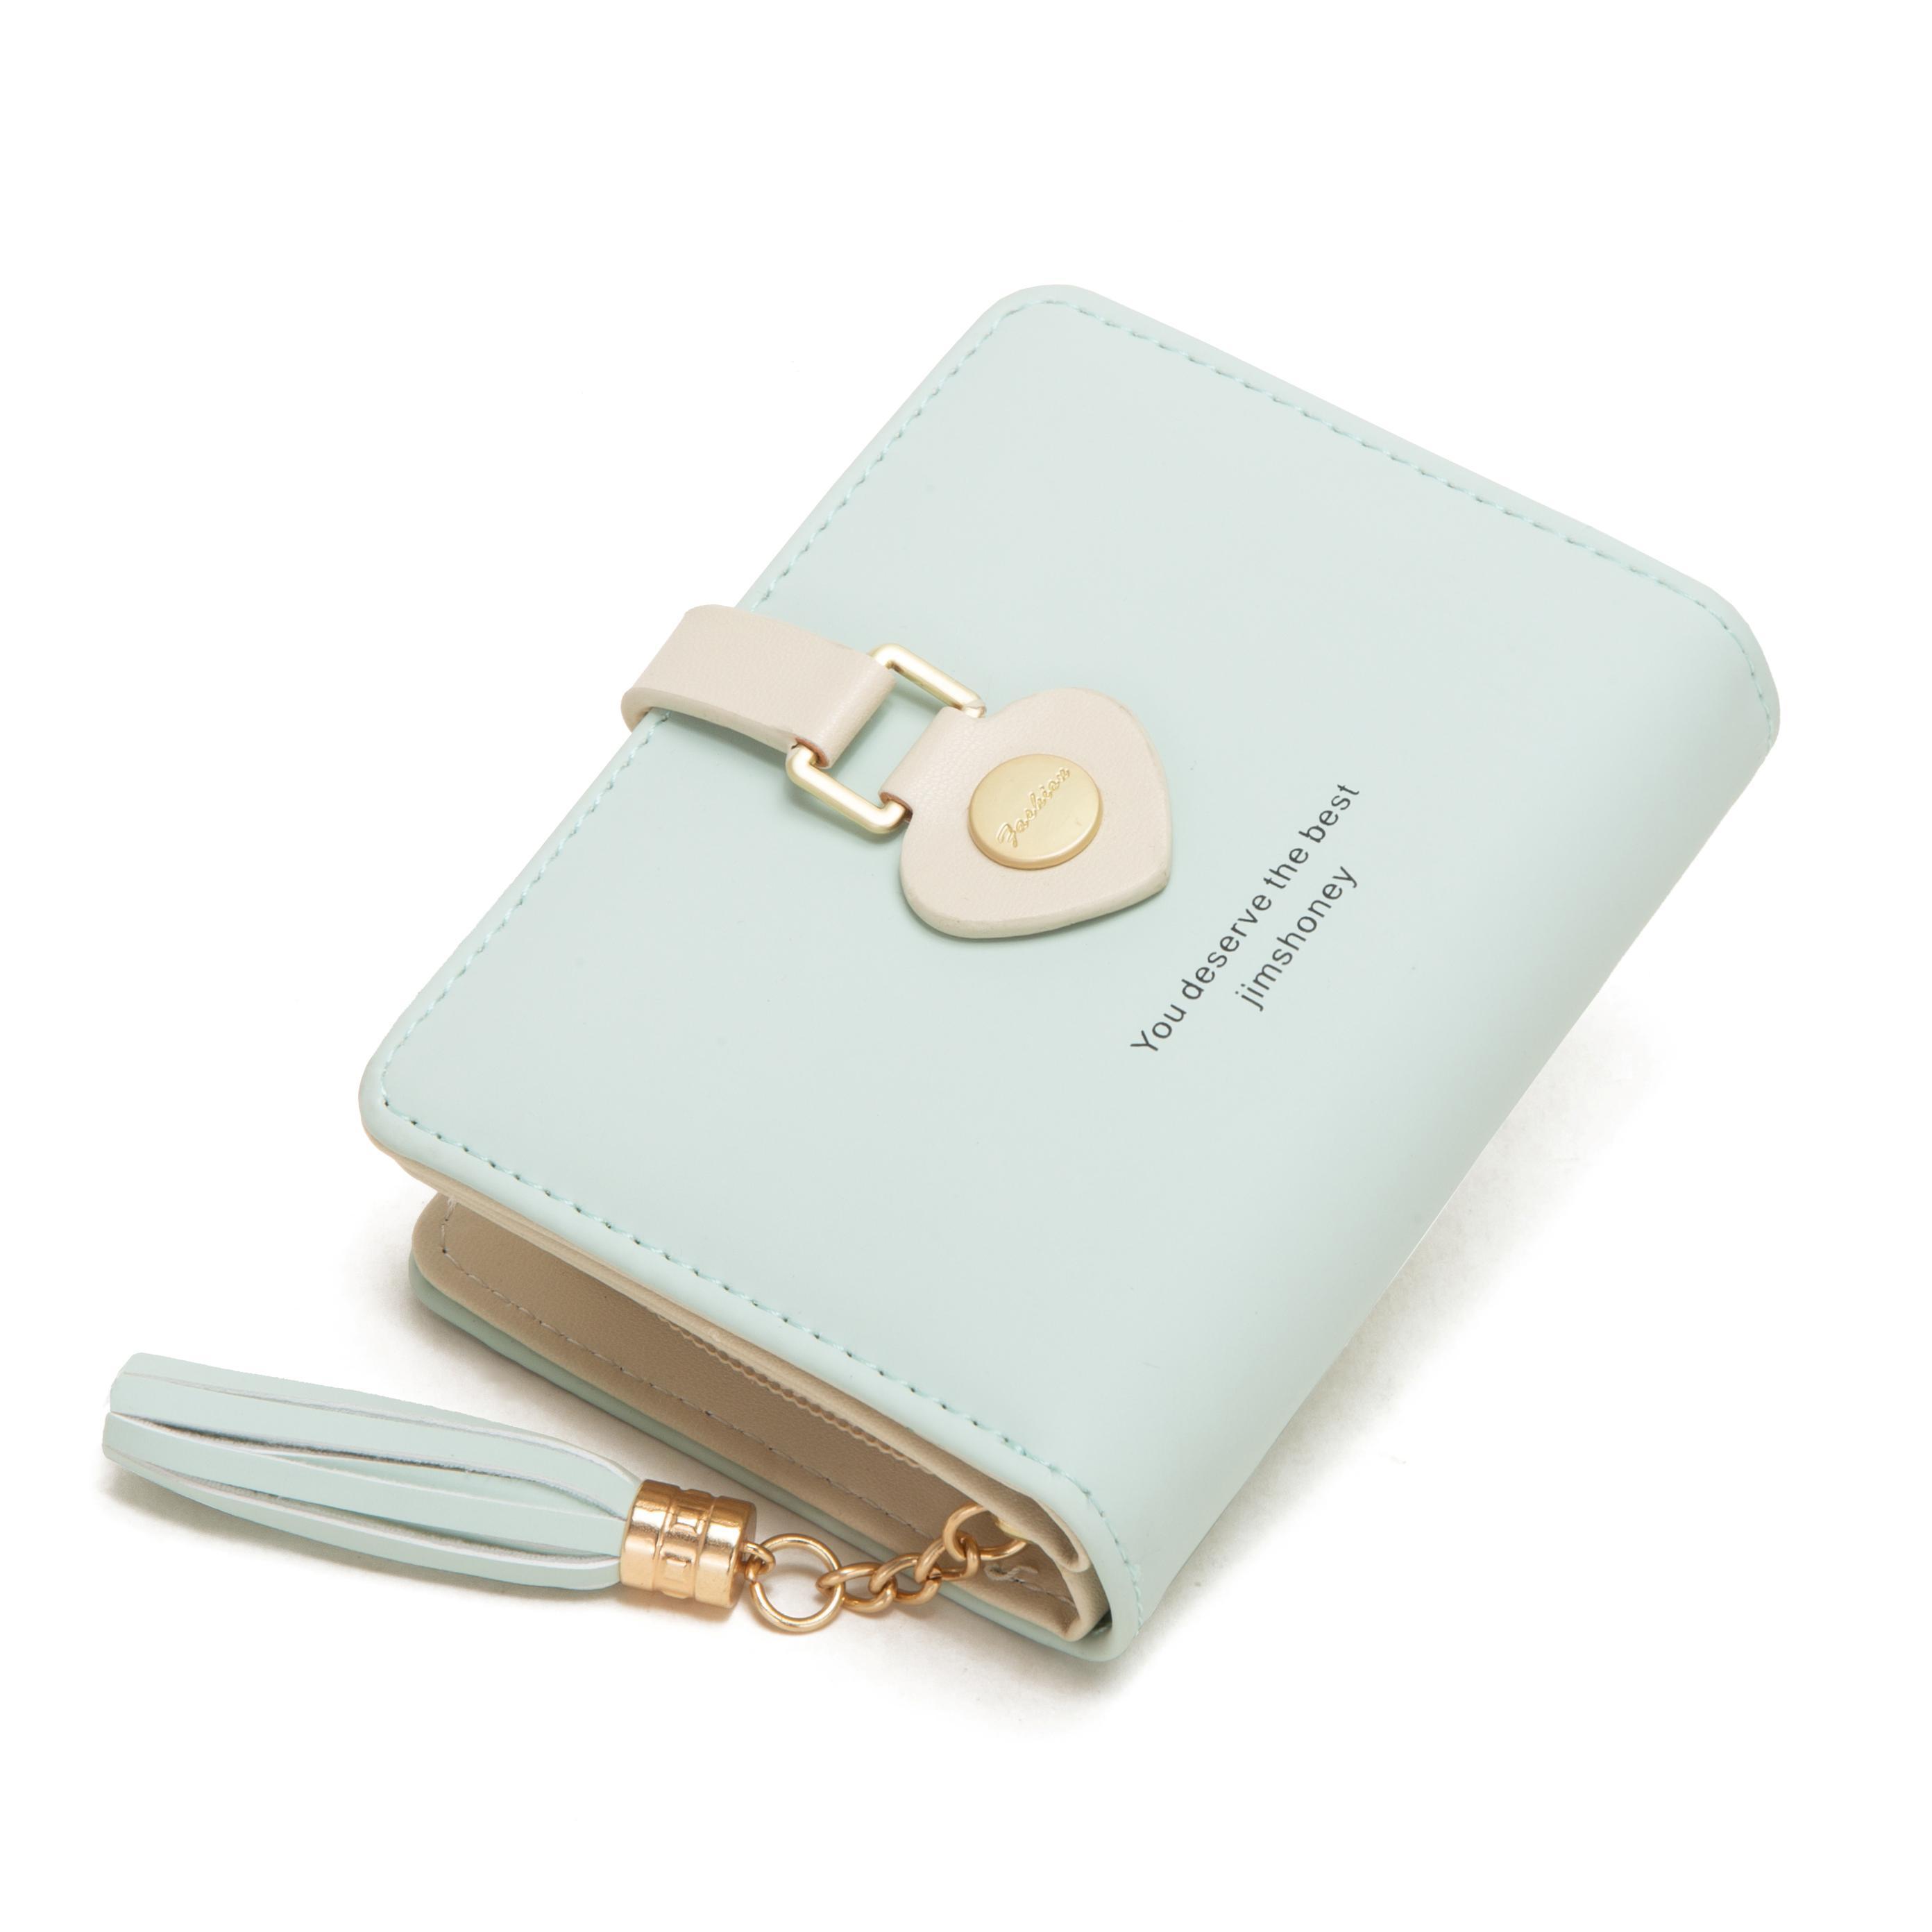 Jims Honey - Mini Kierra Wallet Dompet Wanita Ukuran Kecil